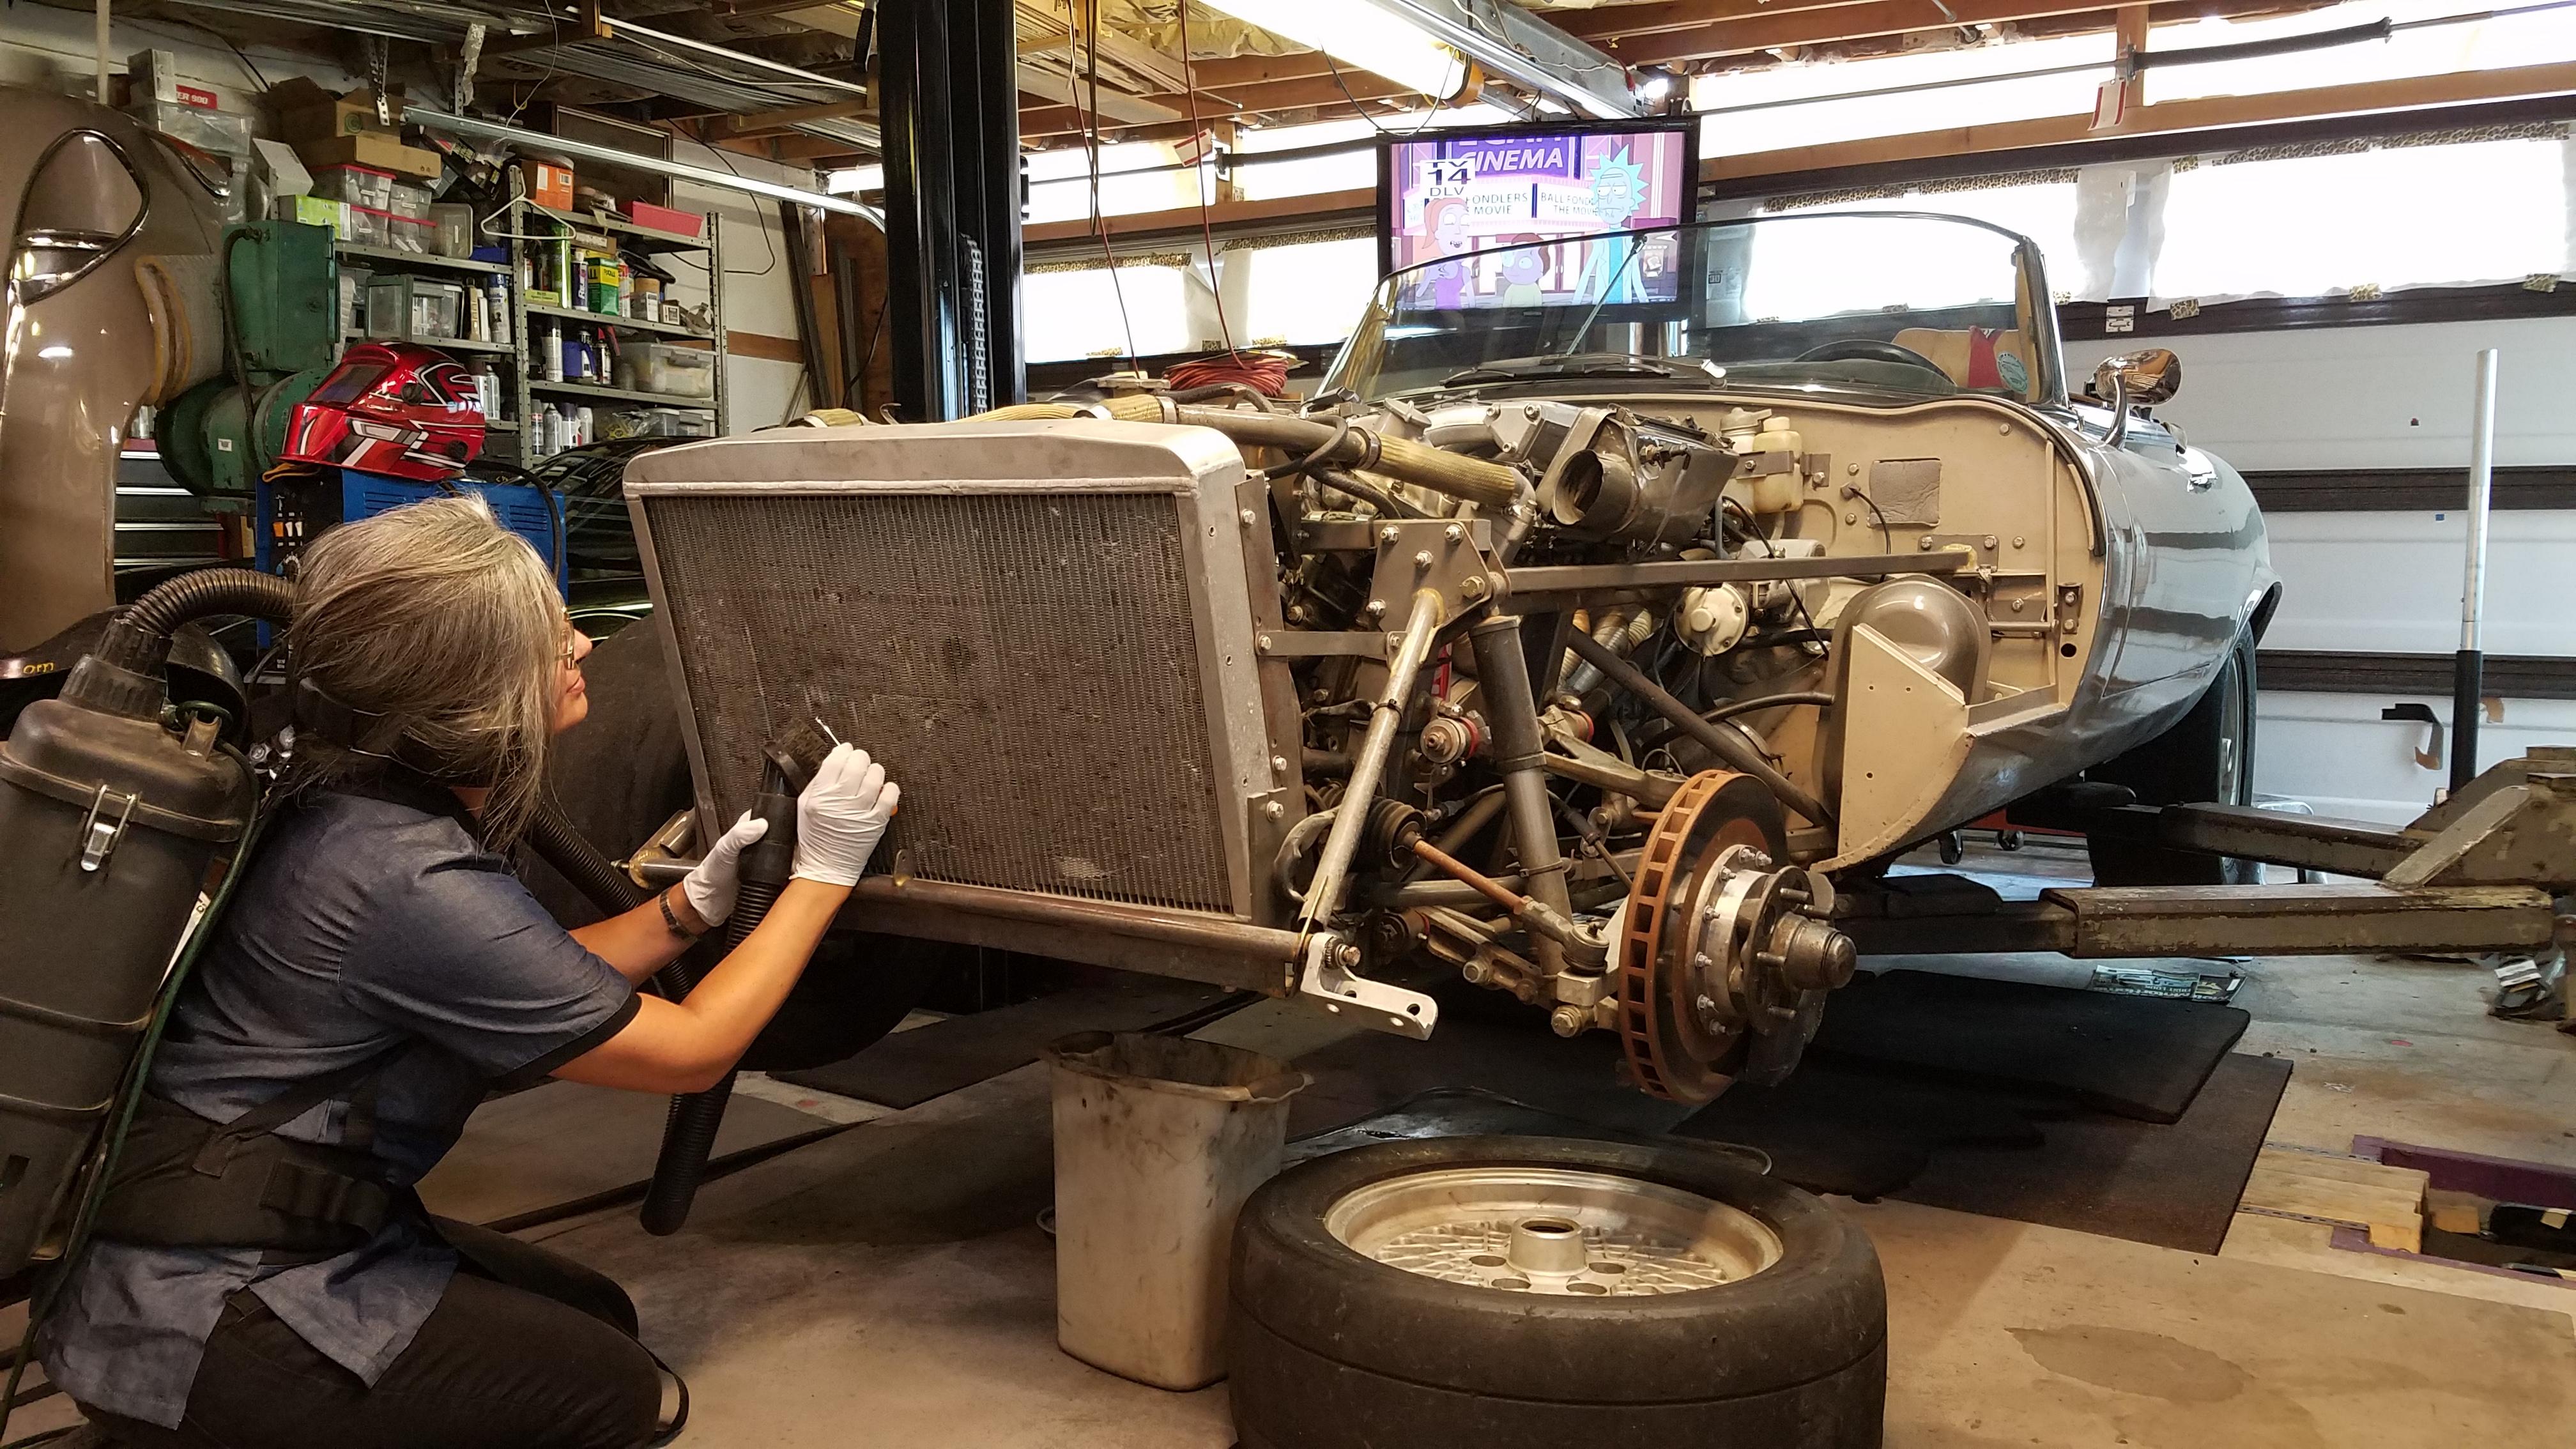 XK120 radiator rebuild - XK - Jag-lovers Forums